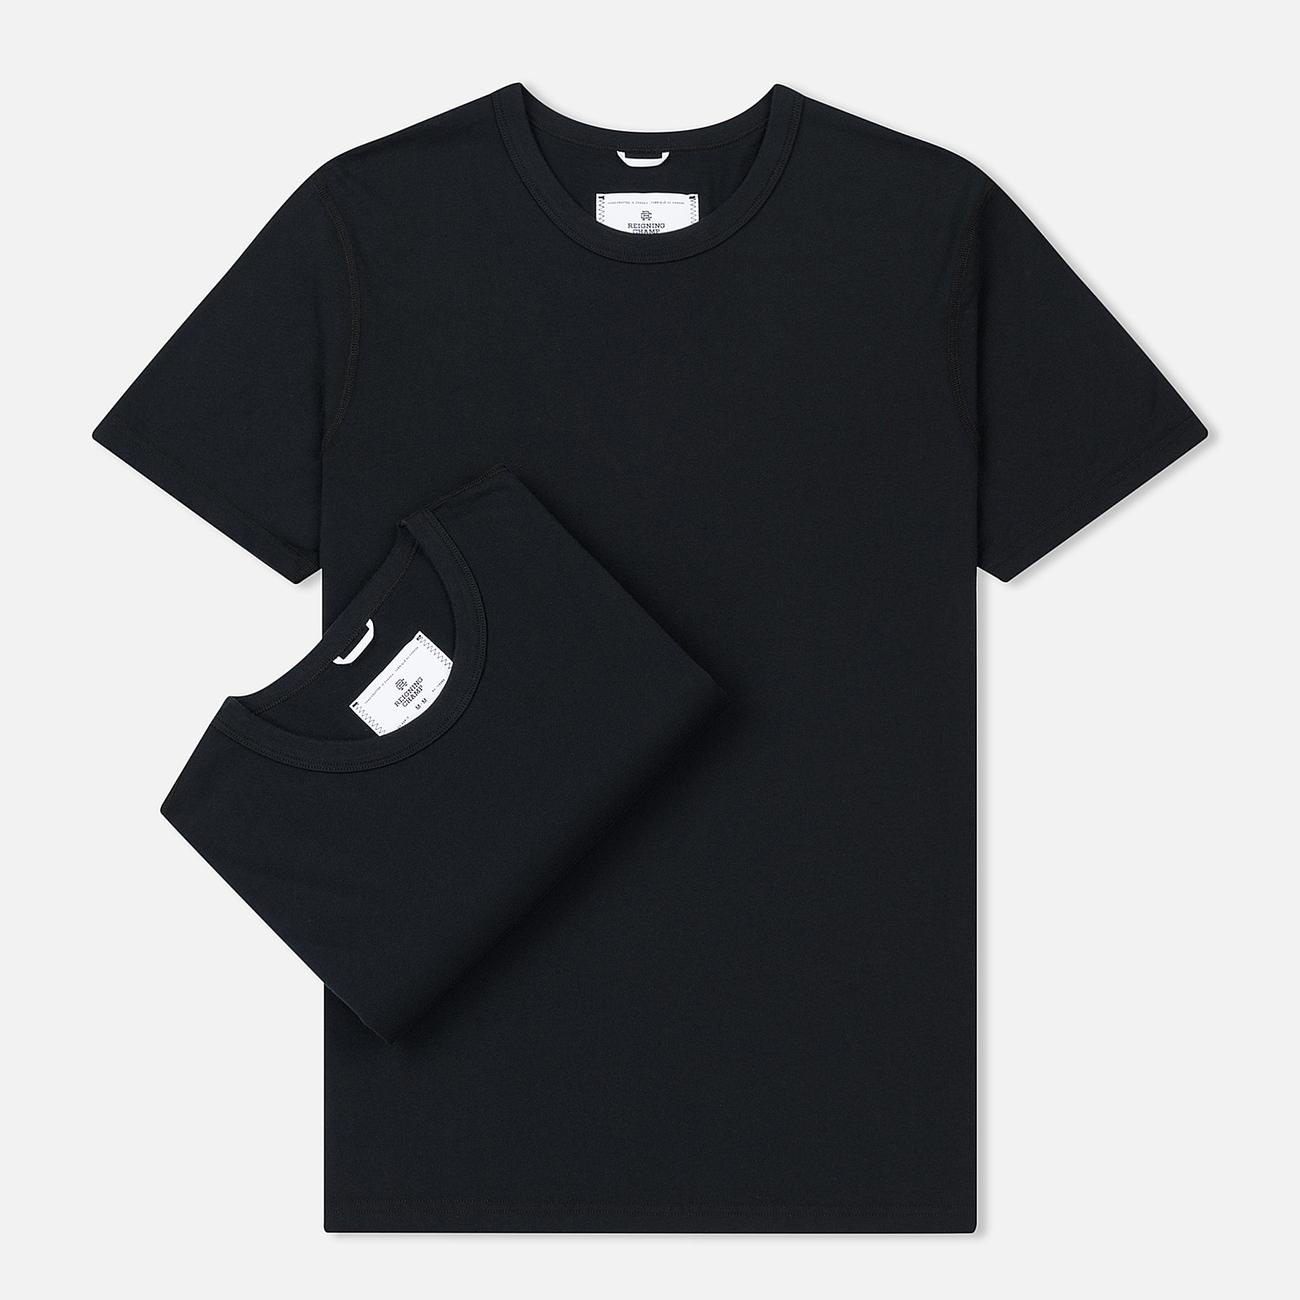 Комплект мужских футболок Reigning Champ Knit Jersey Set 2 Pack Black